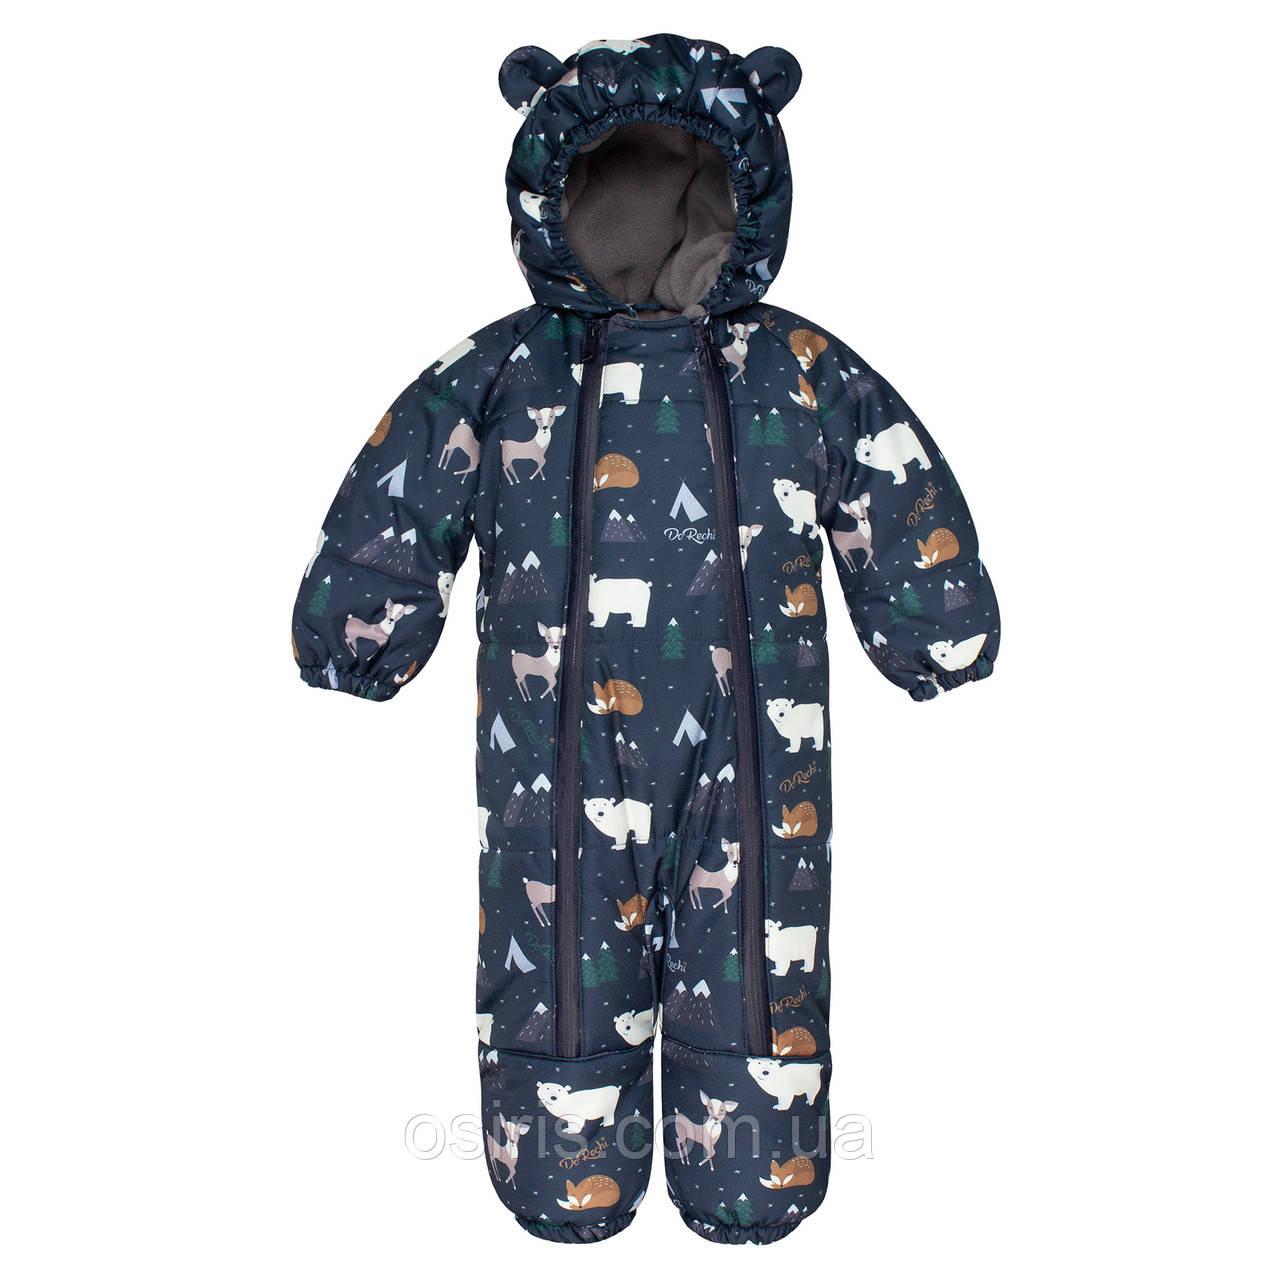 Комбинезон зимний детский Discovery Синяя Арктика / Детские зимние комбинезоны